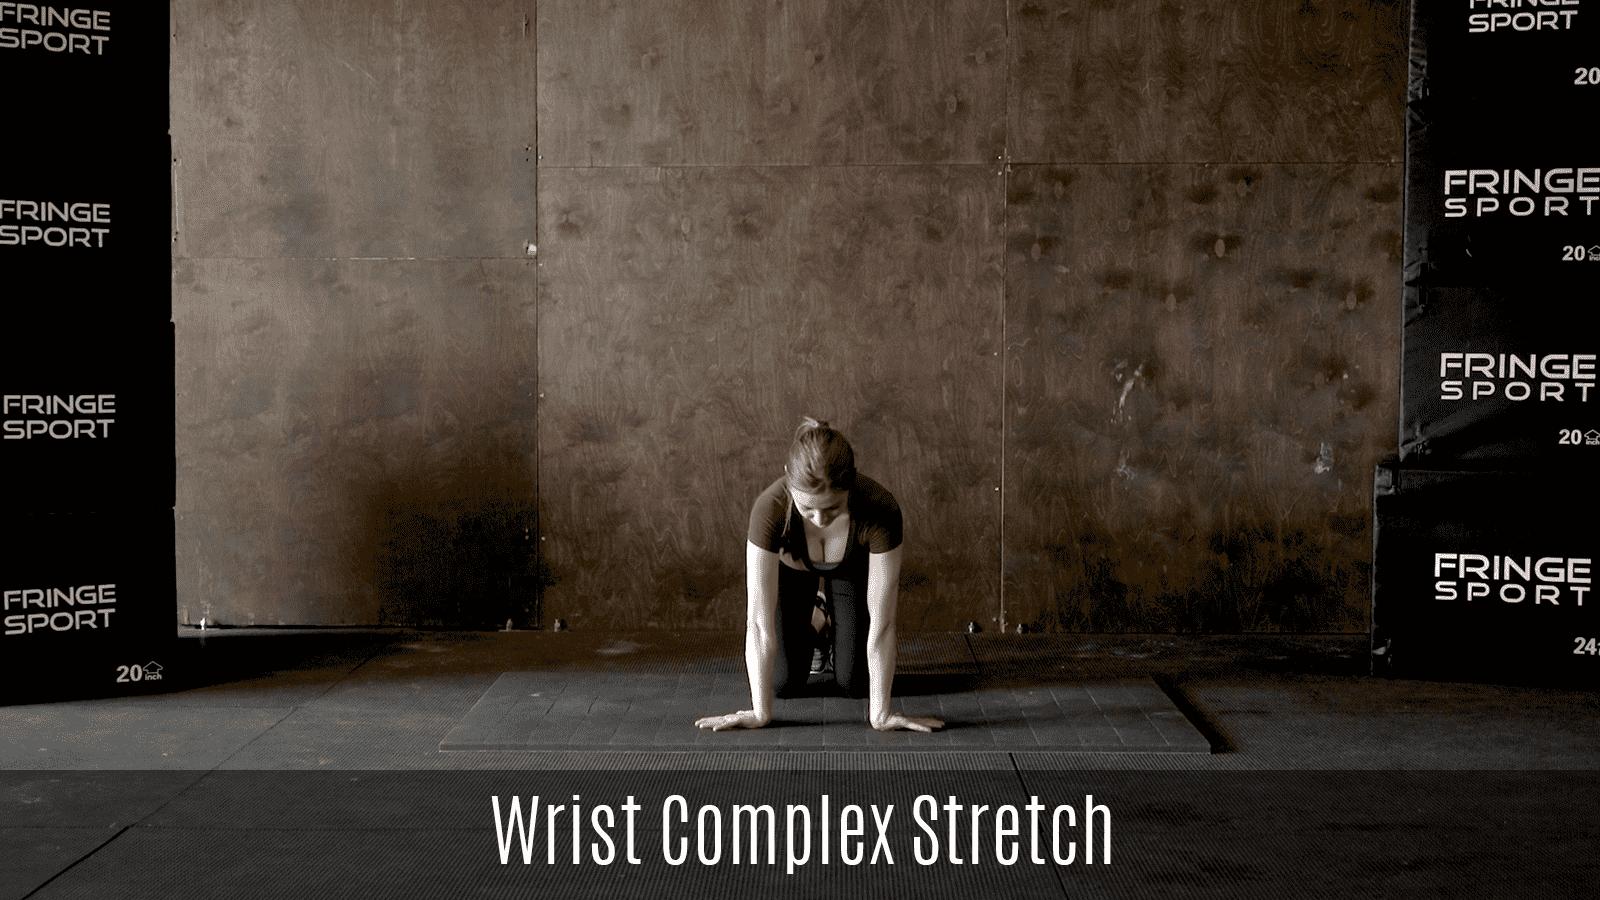 wrist complex stretch demo